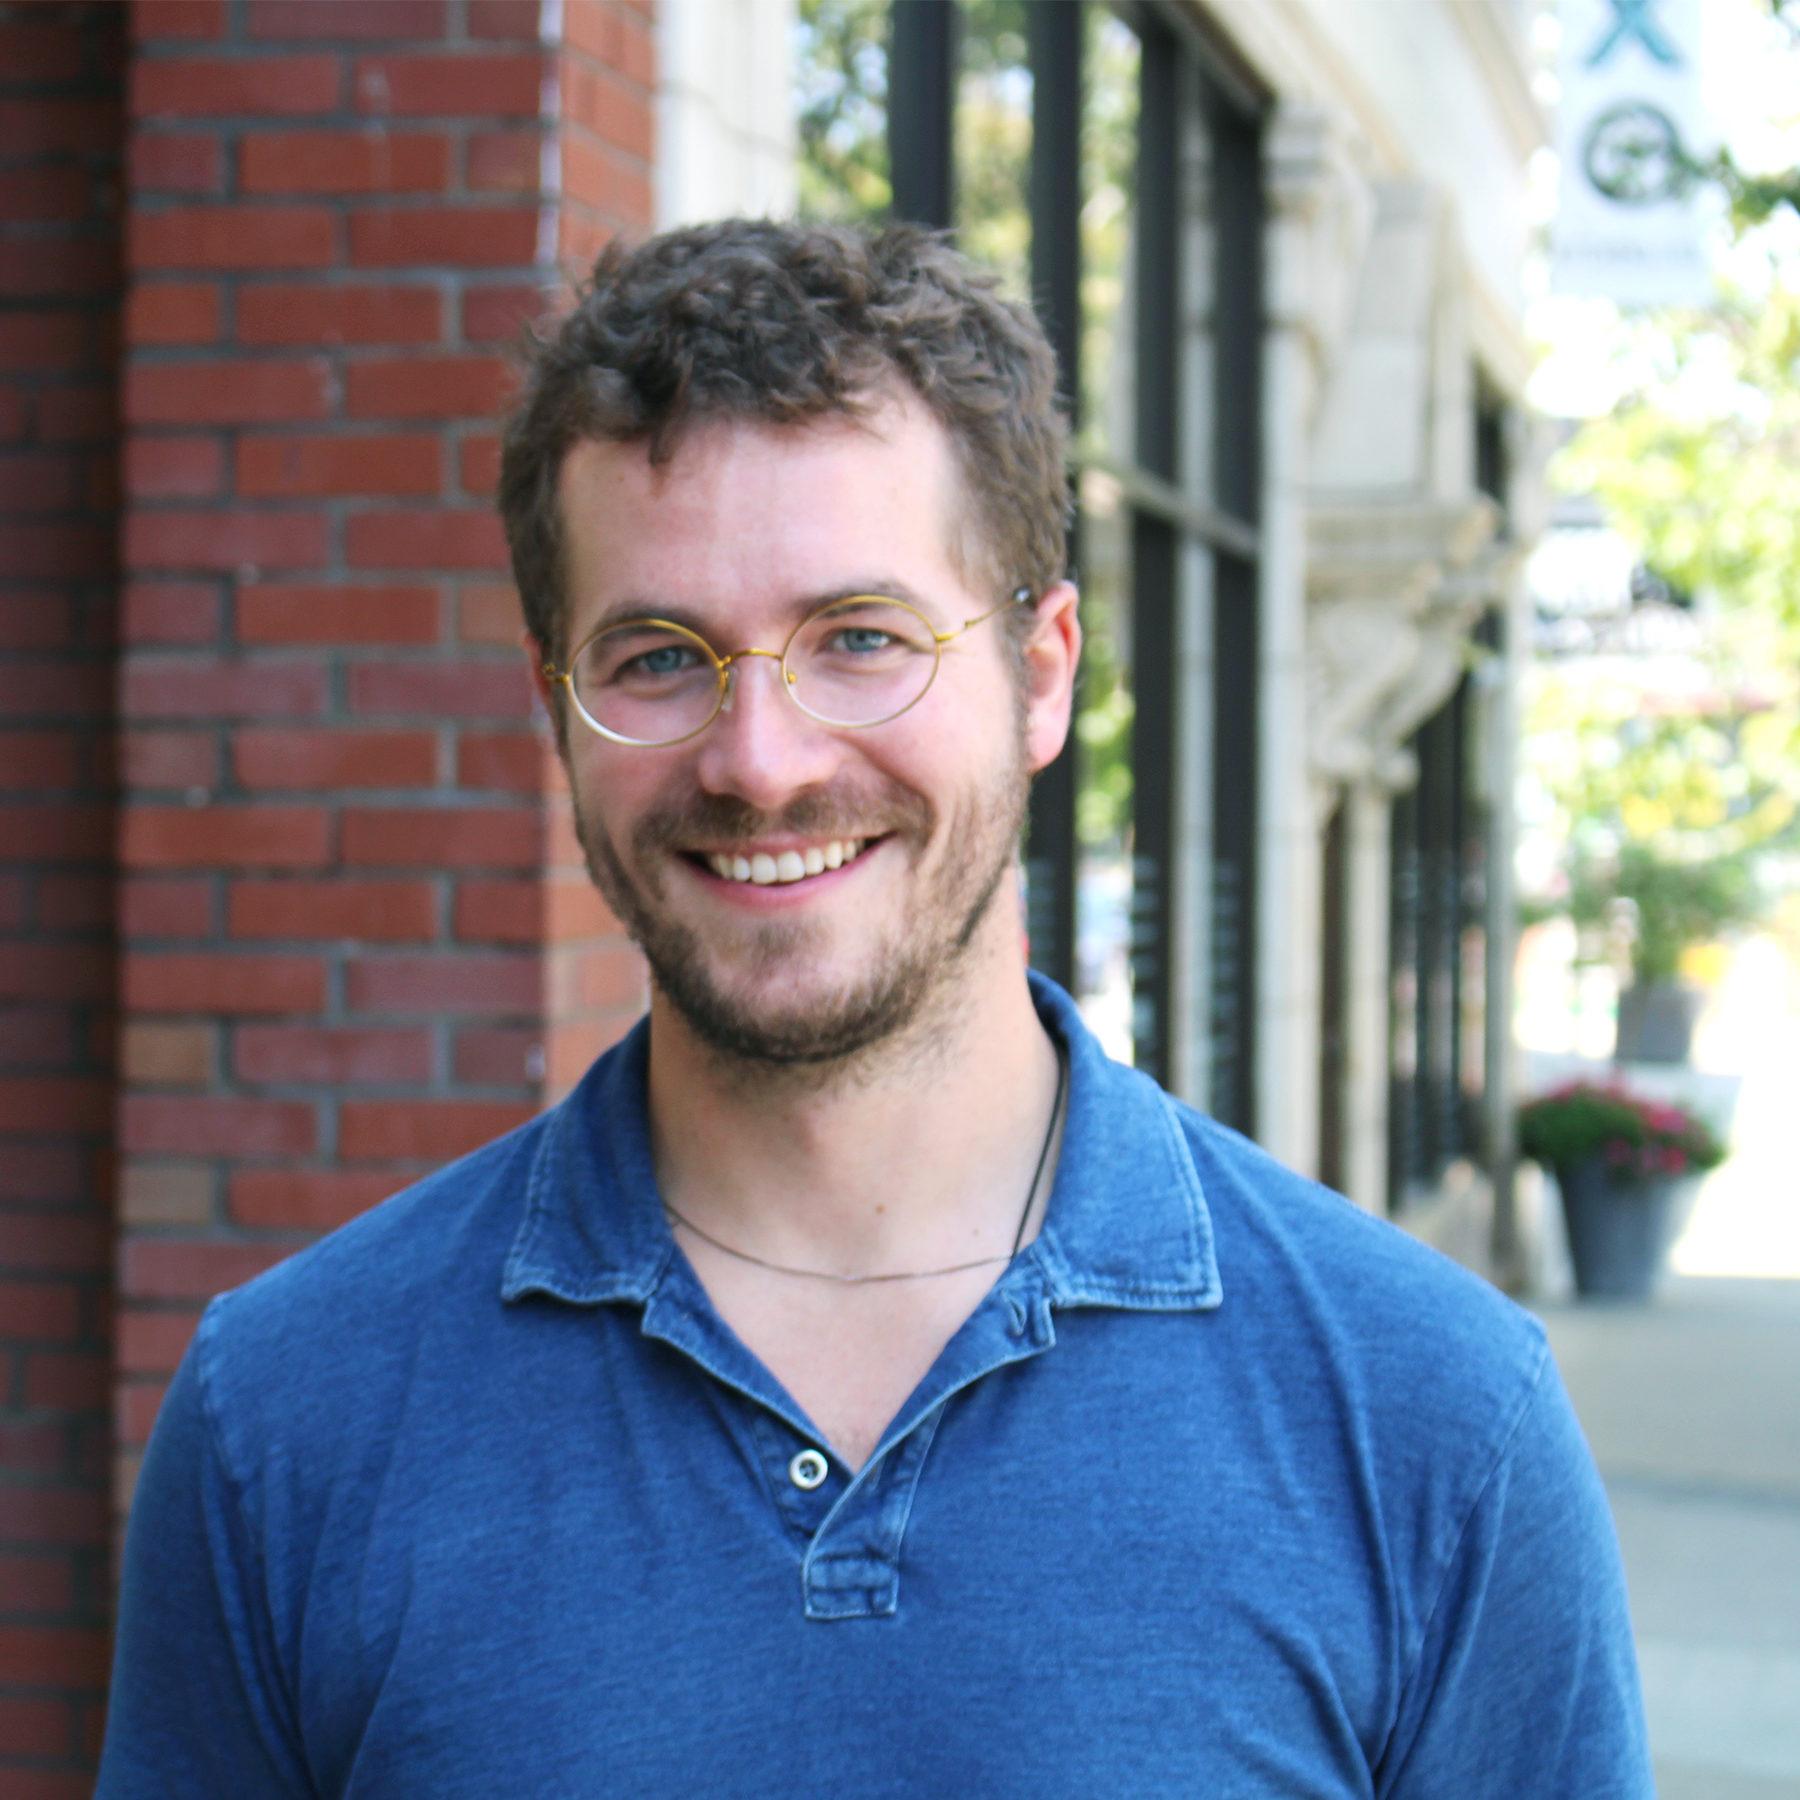 Chris_Staff Photo Web